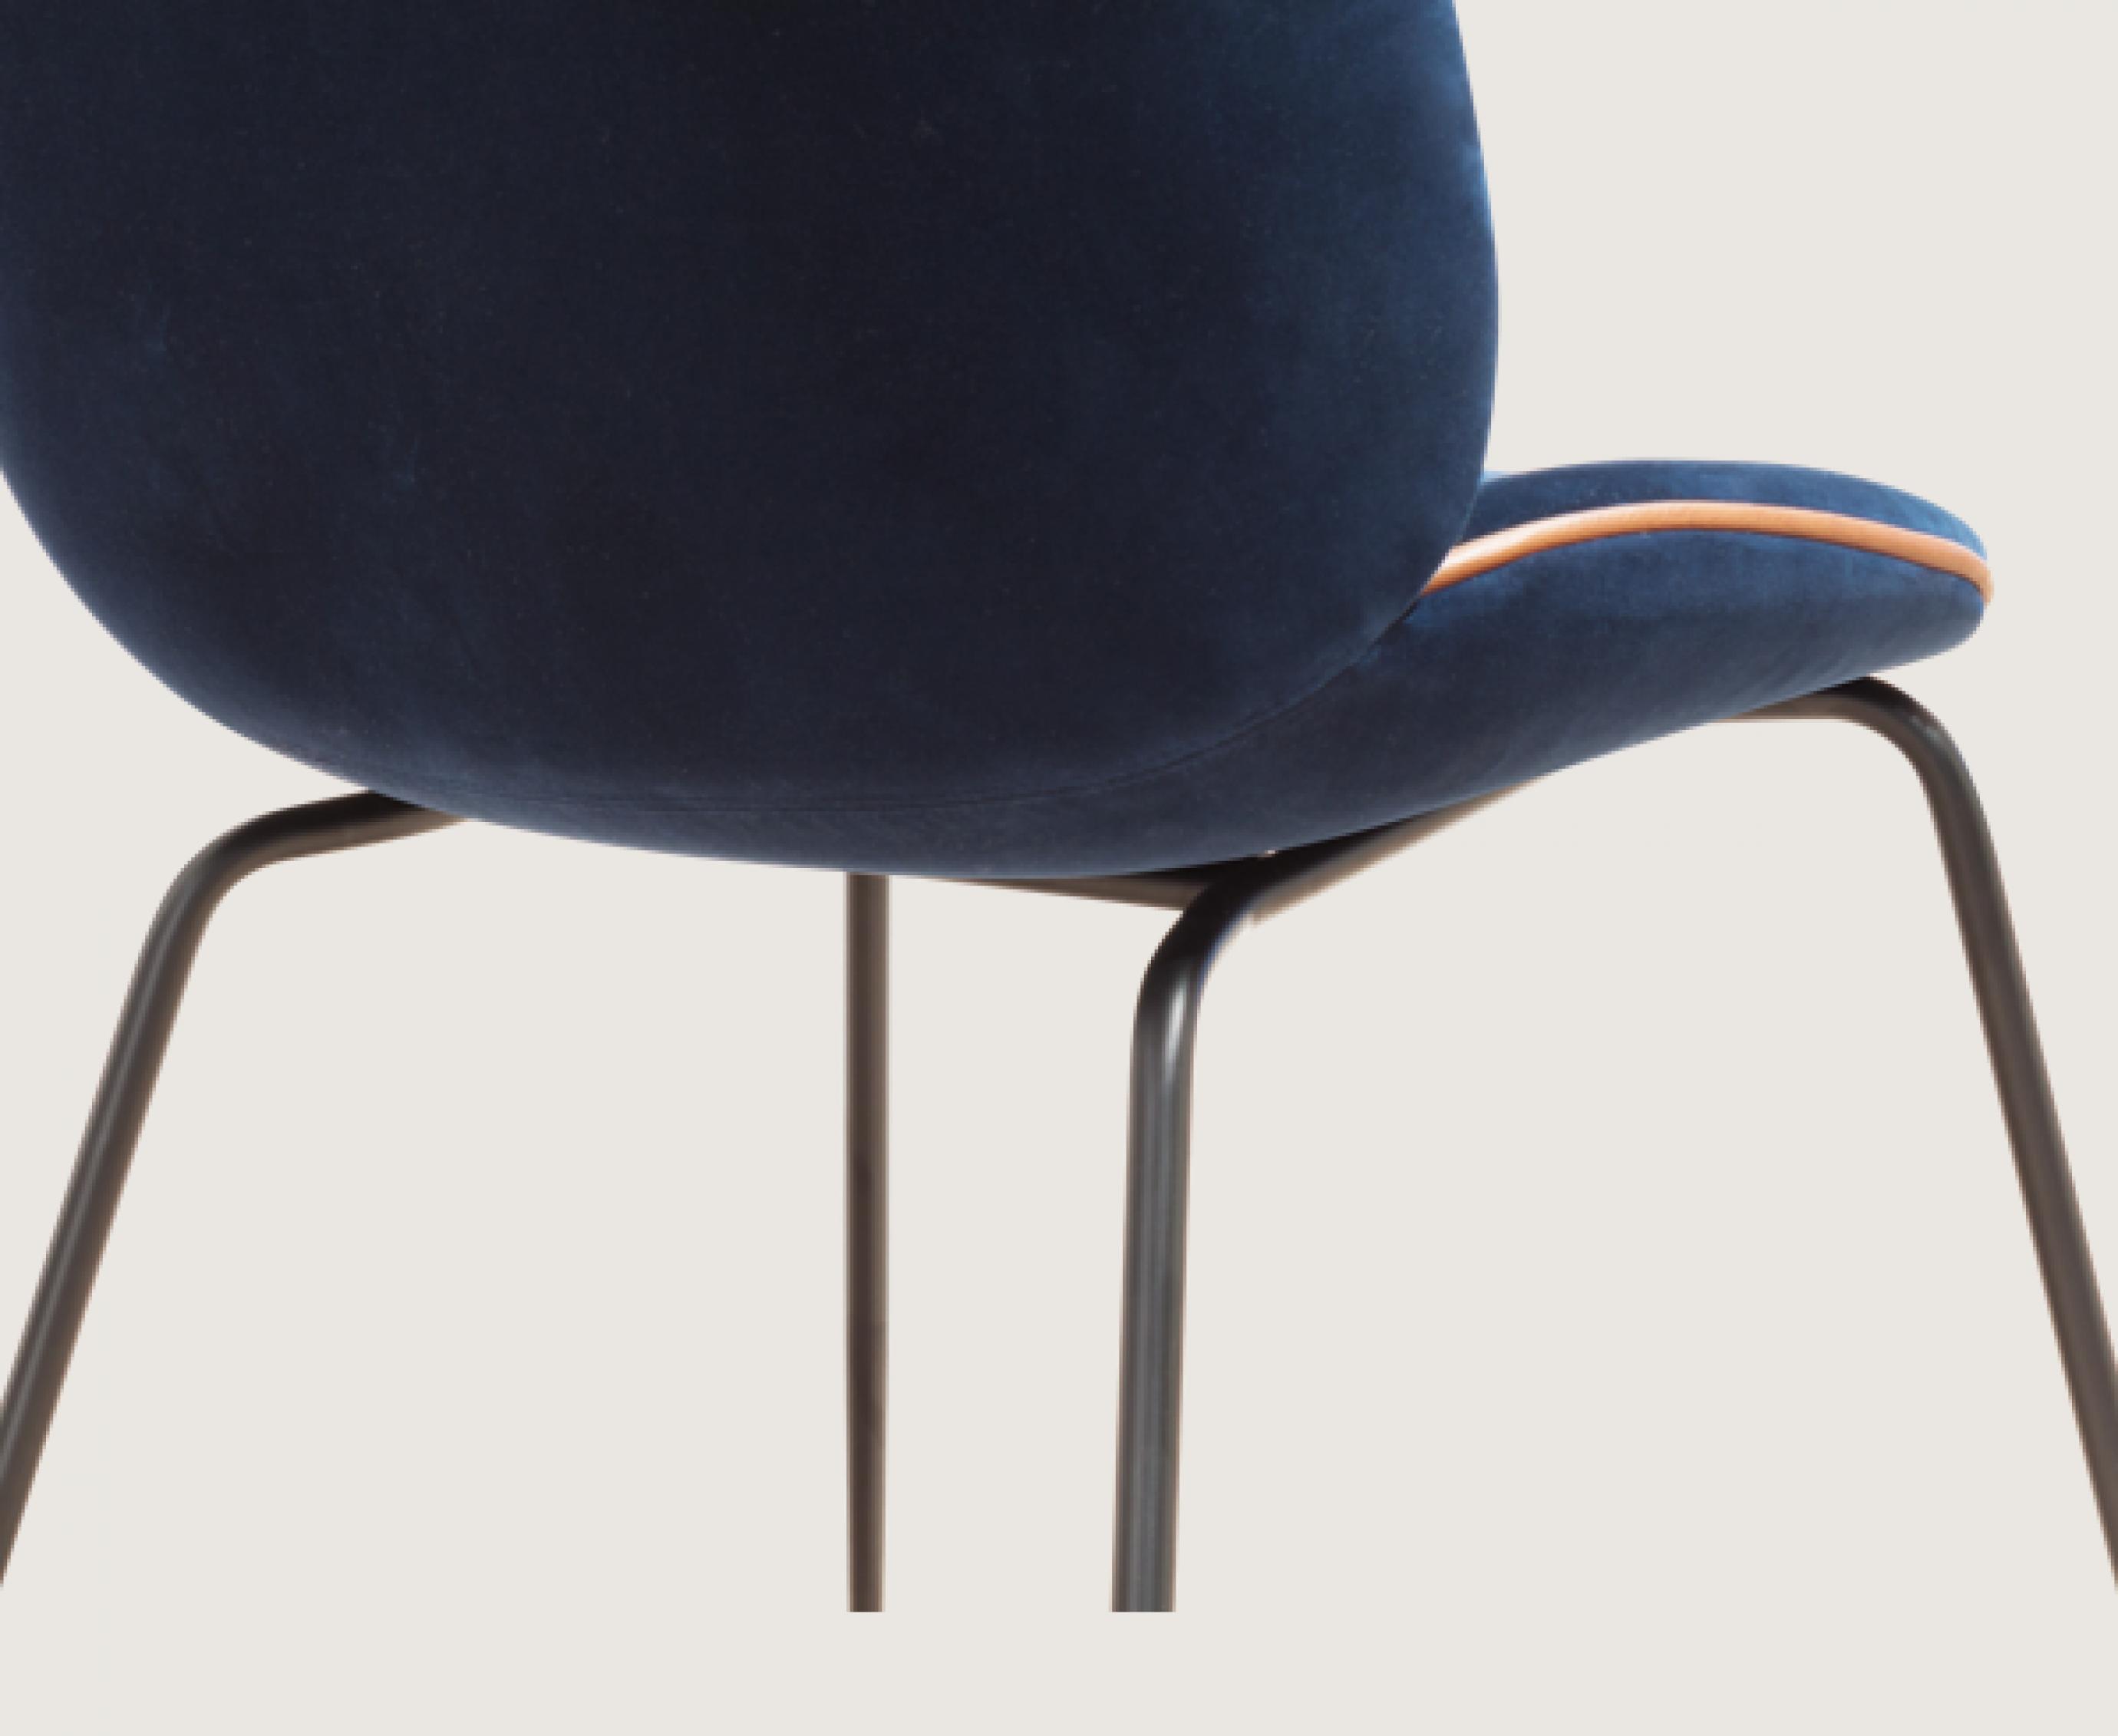 Beetle for life velvet - piping: brandy leather Victors Design Agency